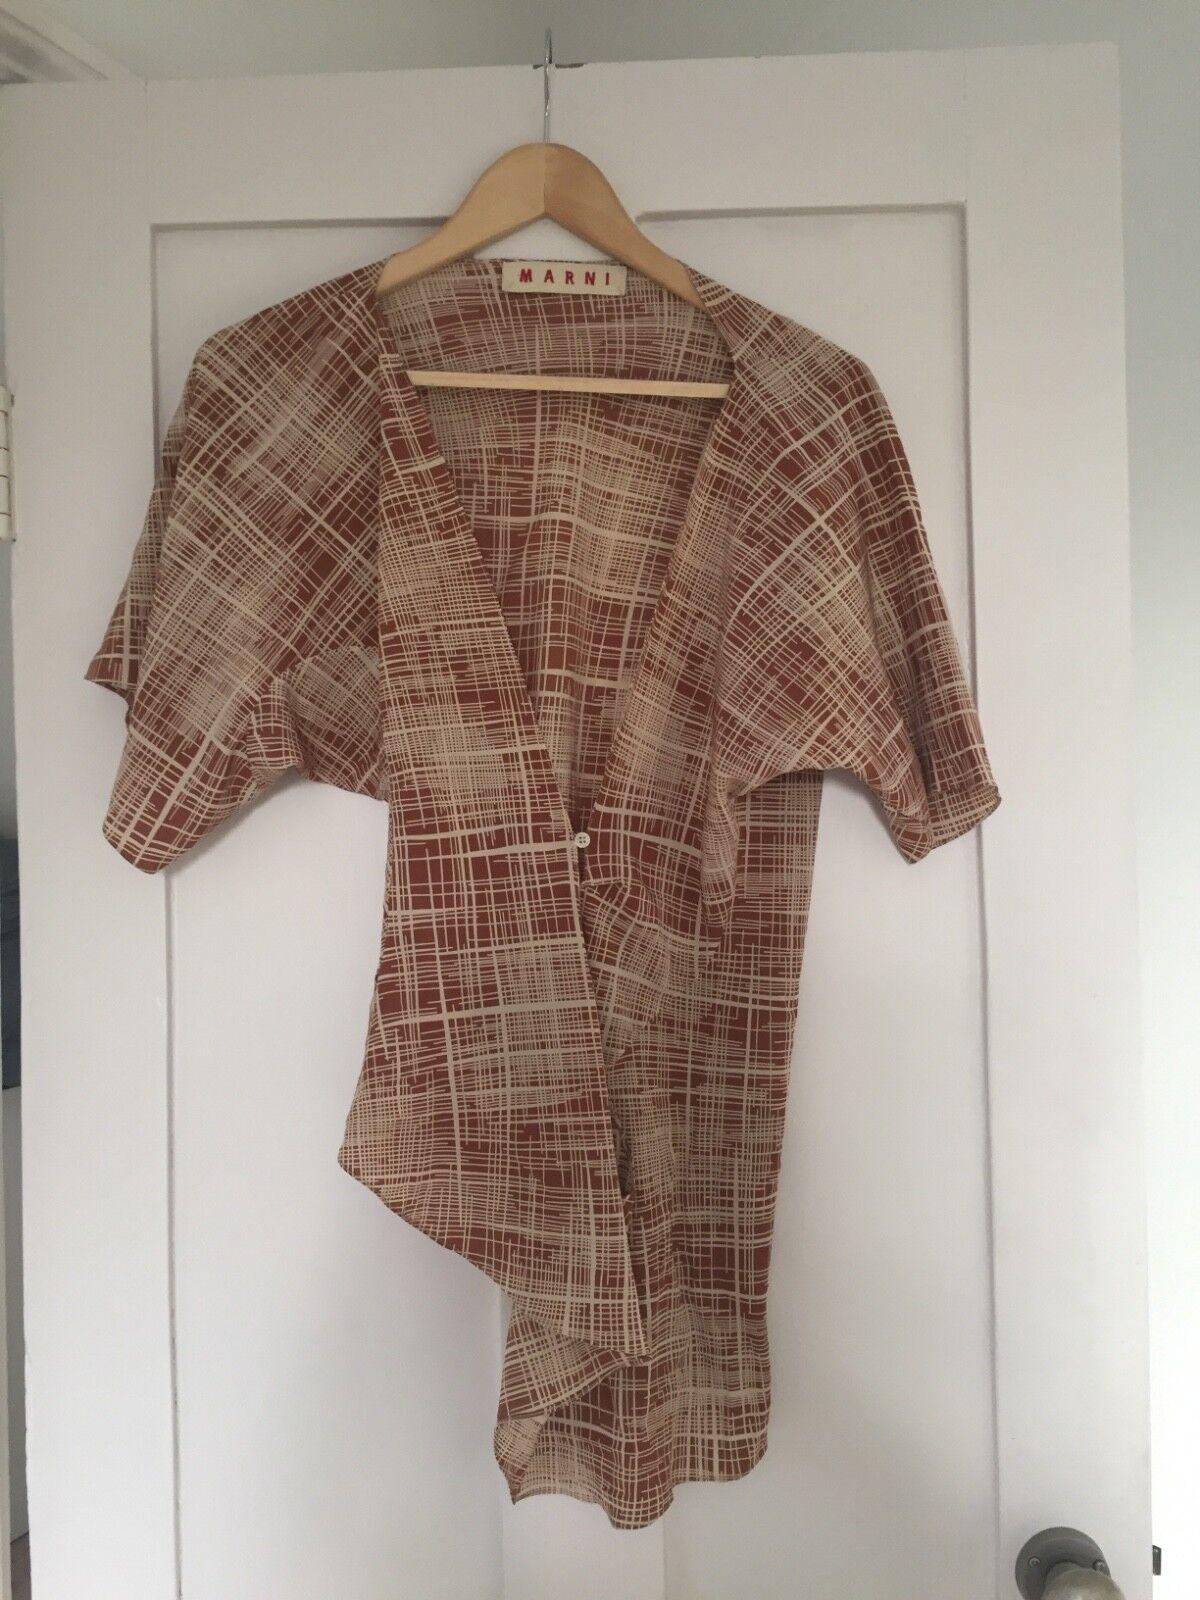 MARNI MARNI MARNI 100% SETA  Kimono  stile Wrap Top Taglia 40 65e32a